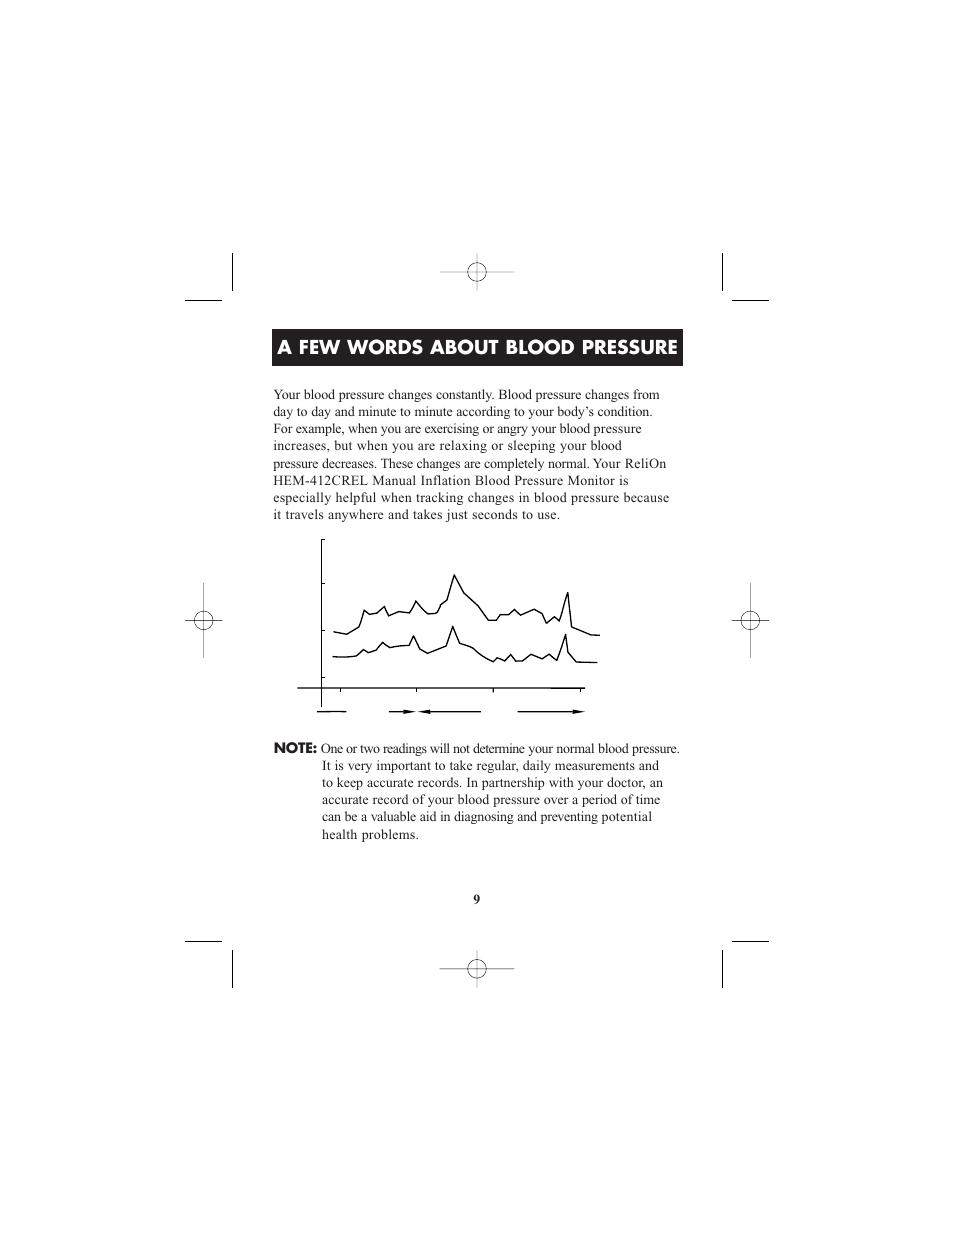 Relion Blood Pressure Monitor Manual Hem 412crel Labzada Wallpaper